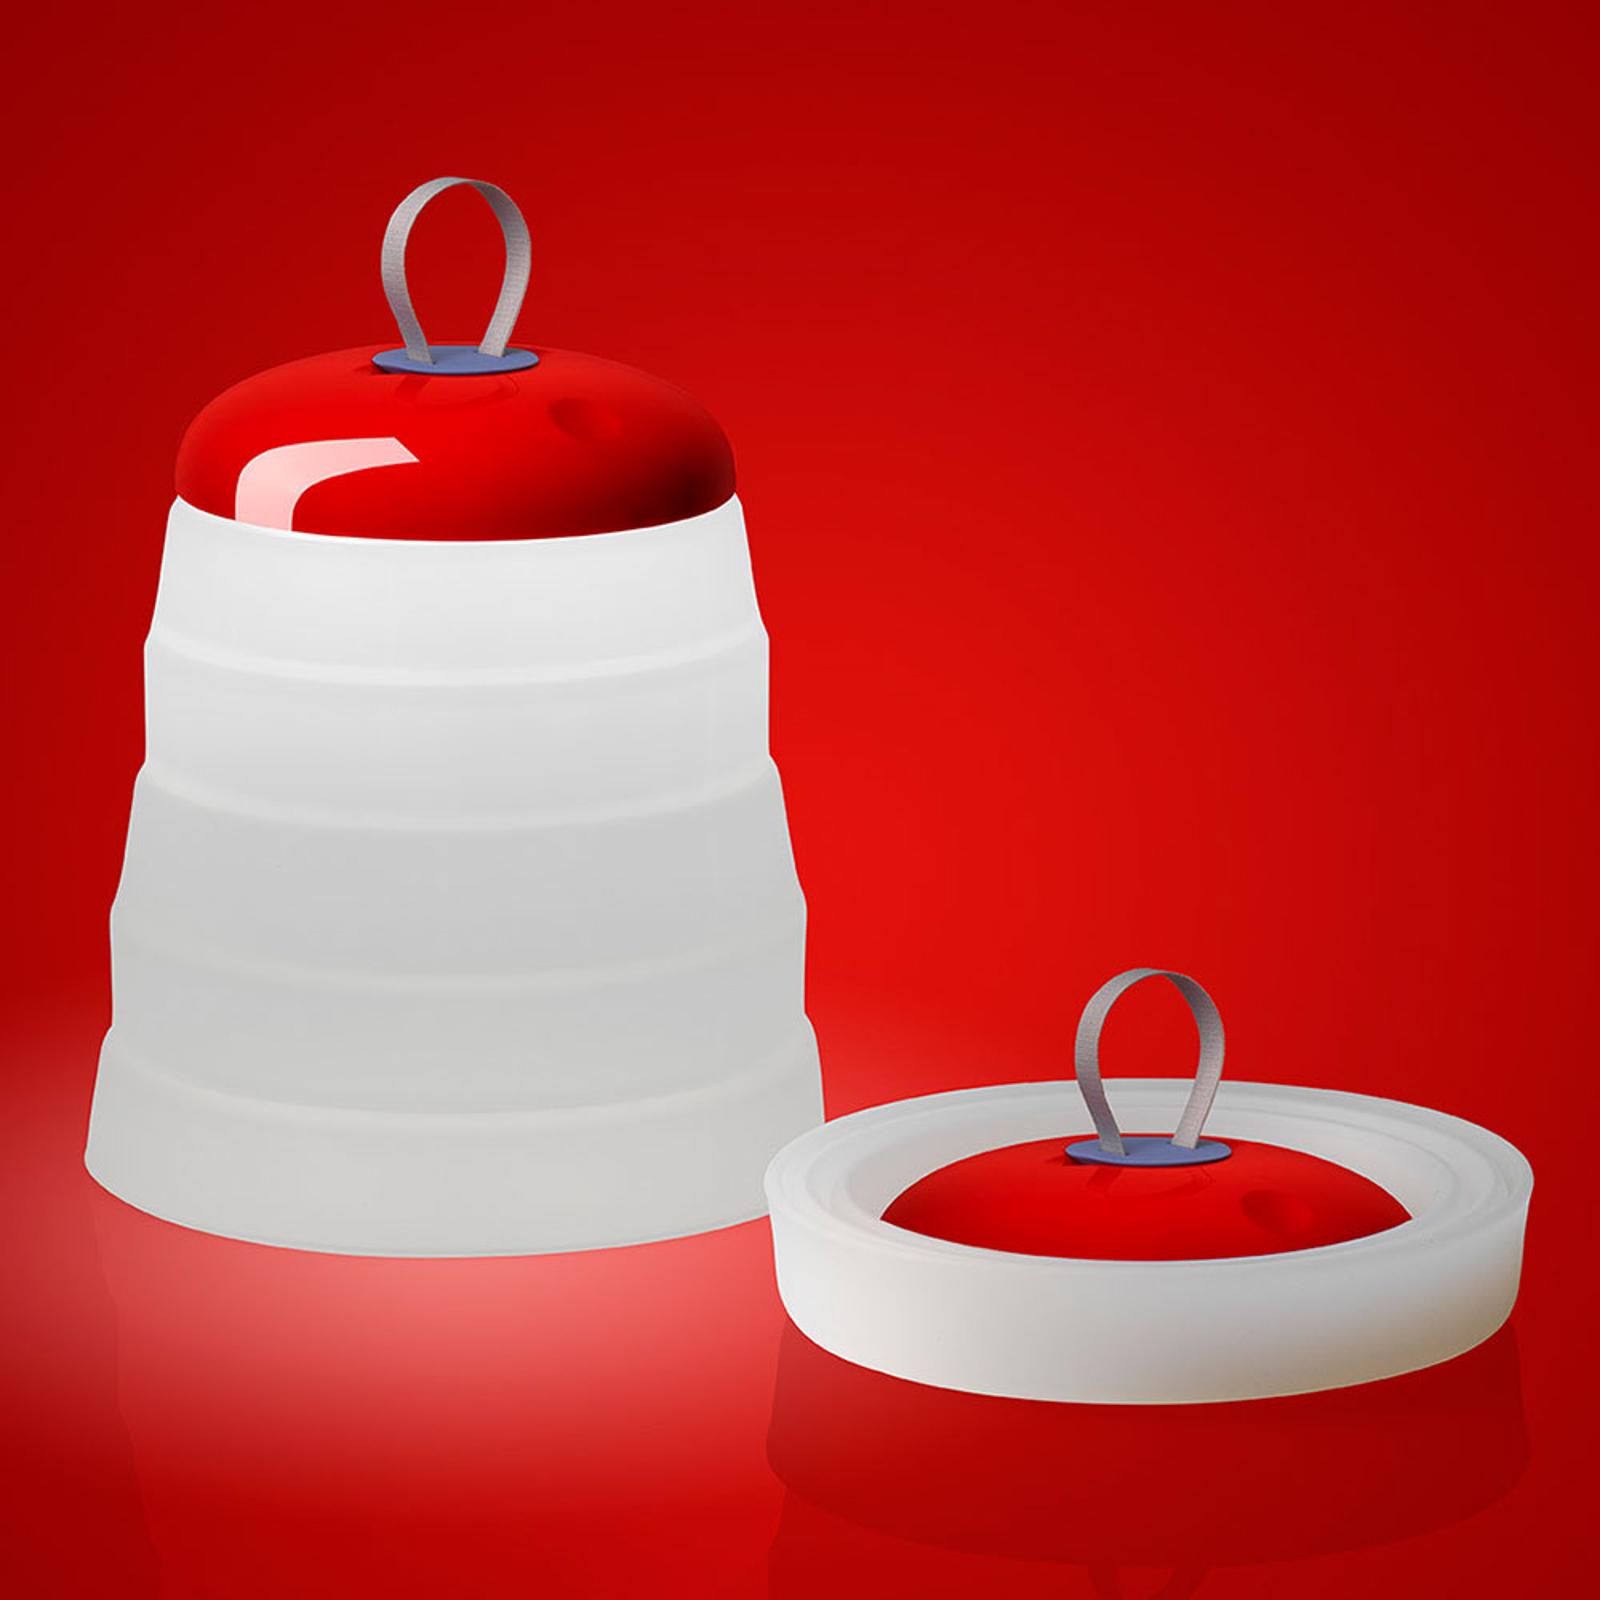 Foscarini Cri Cri LED-Außen-Dekoleuchte, rot